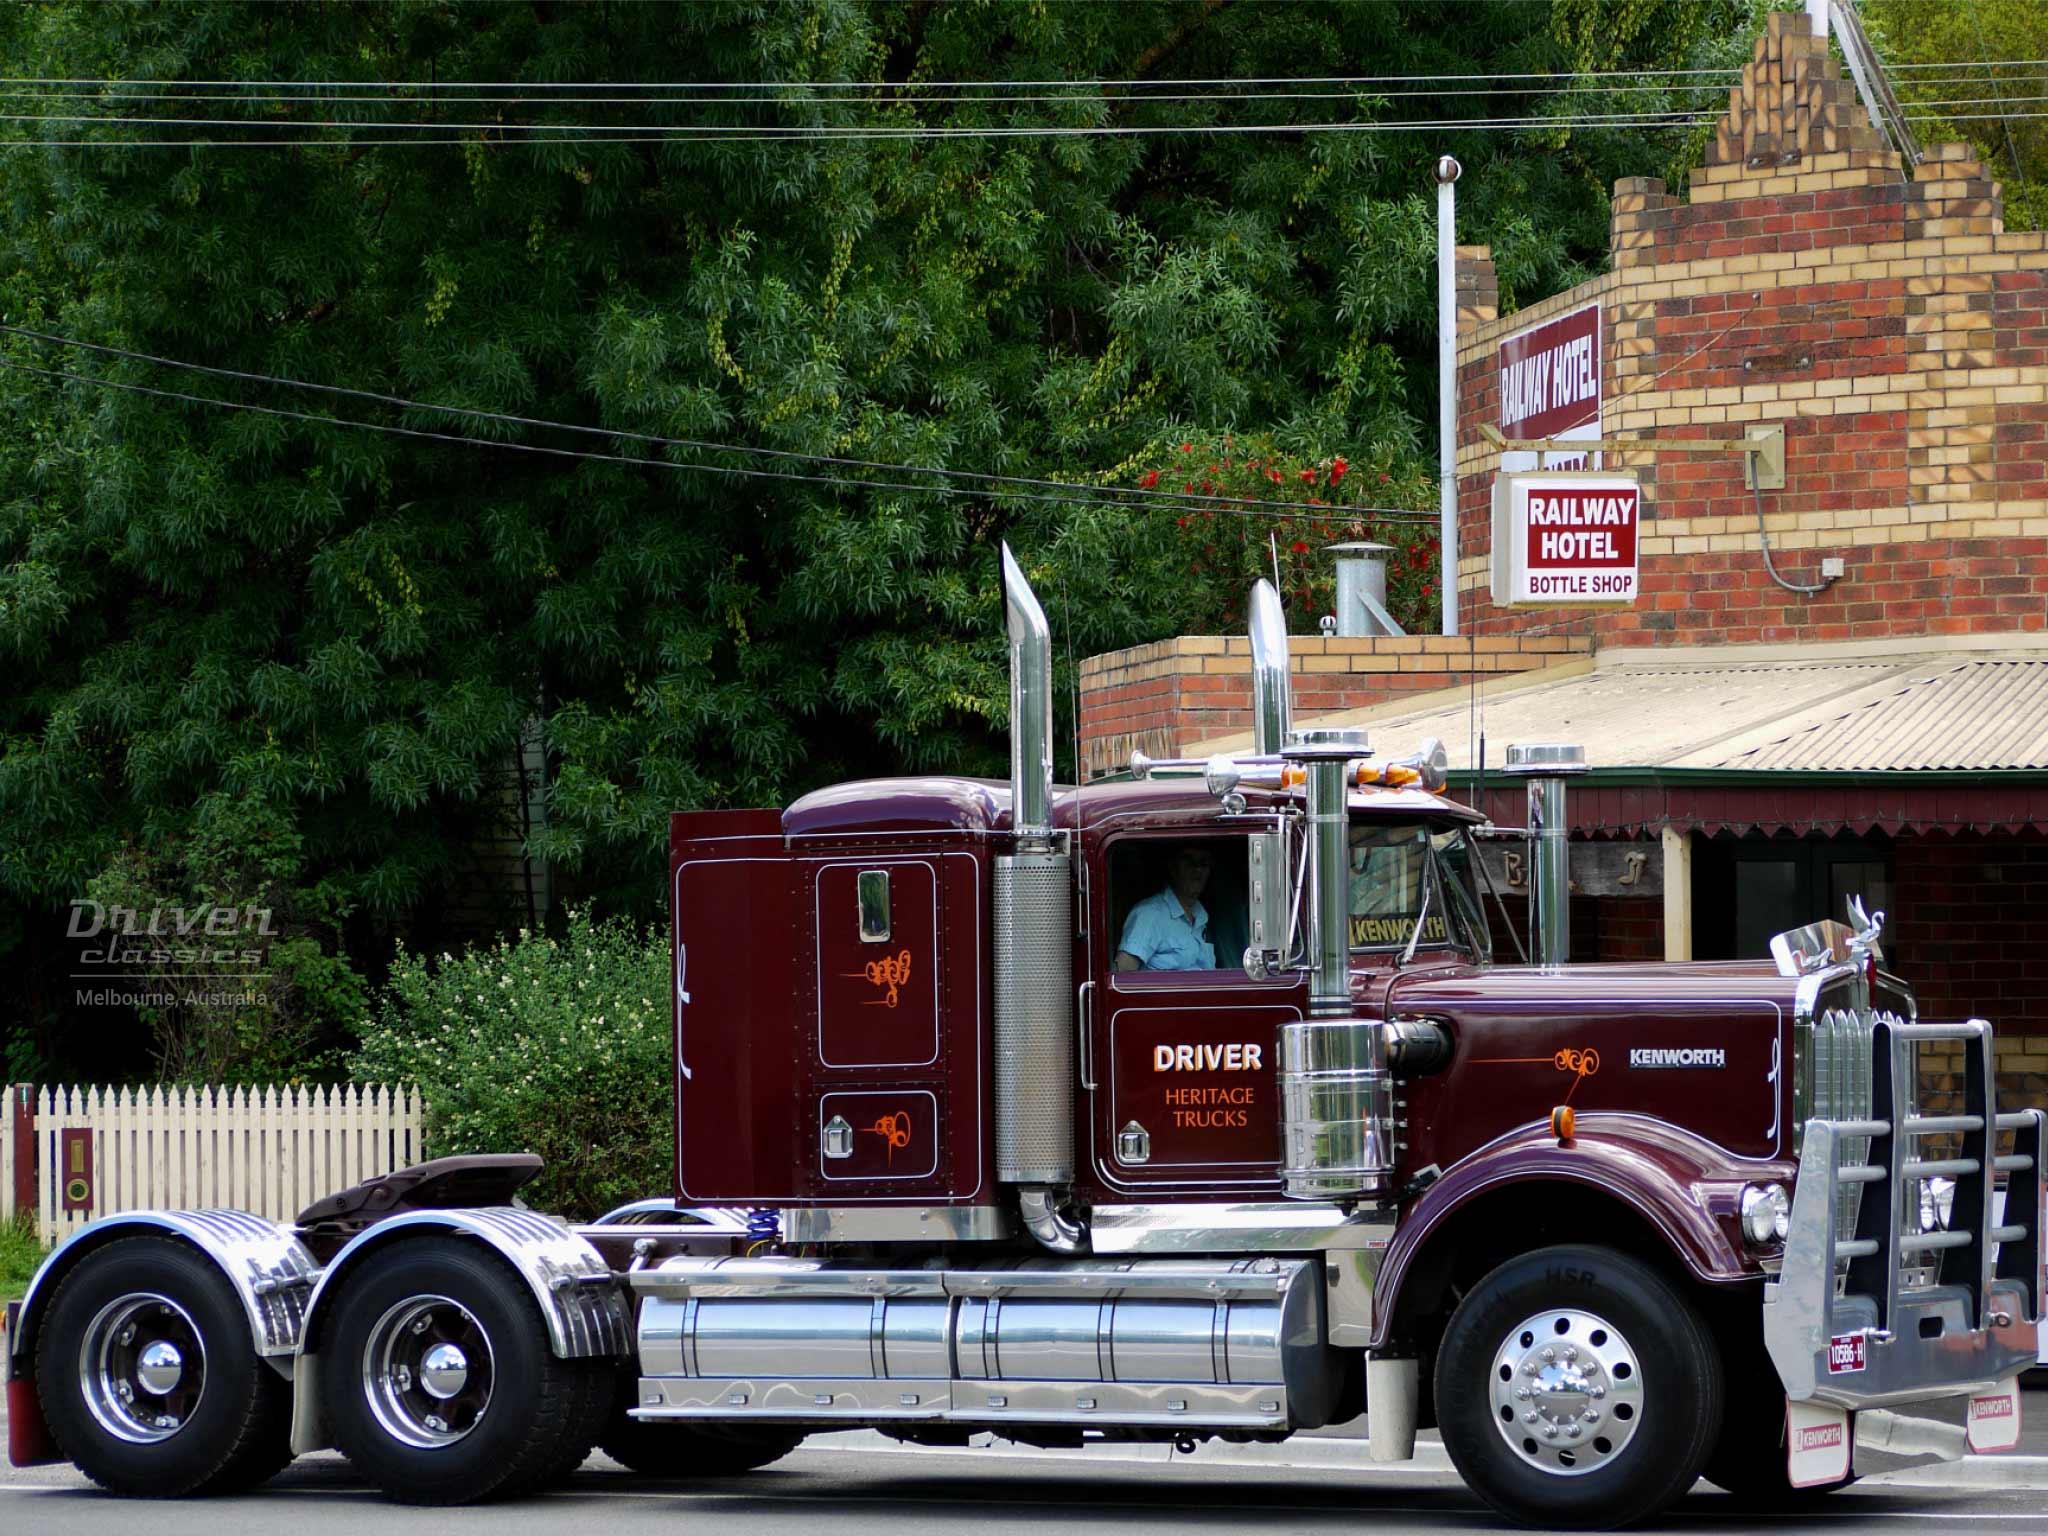 Kenworth W925 truck side